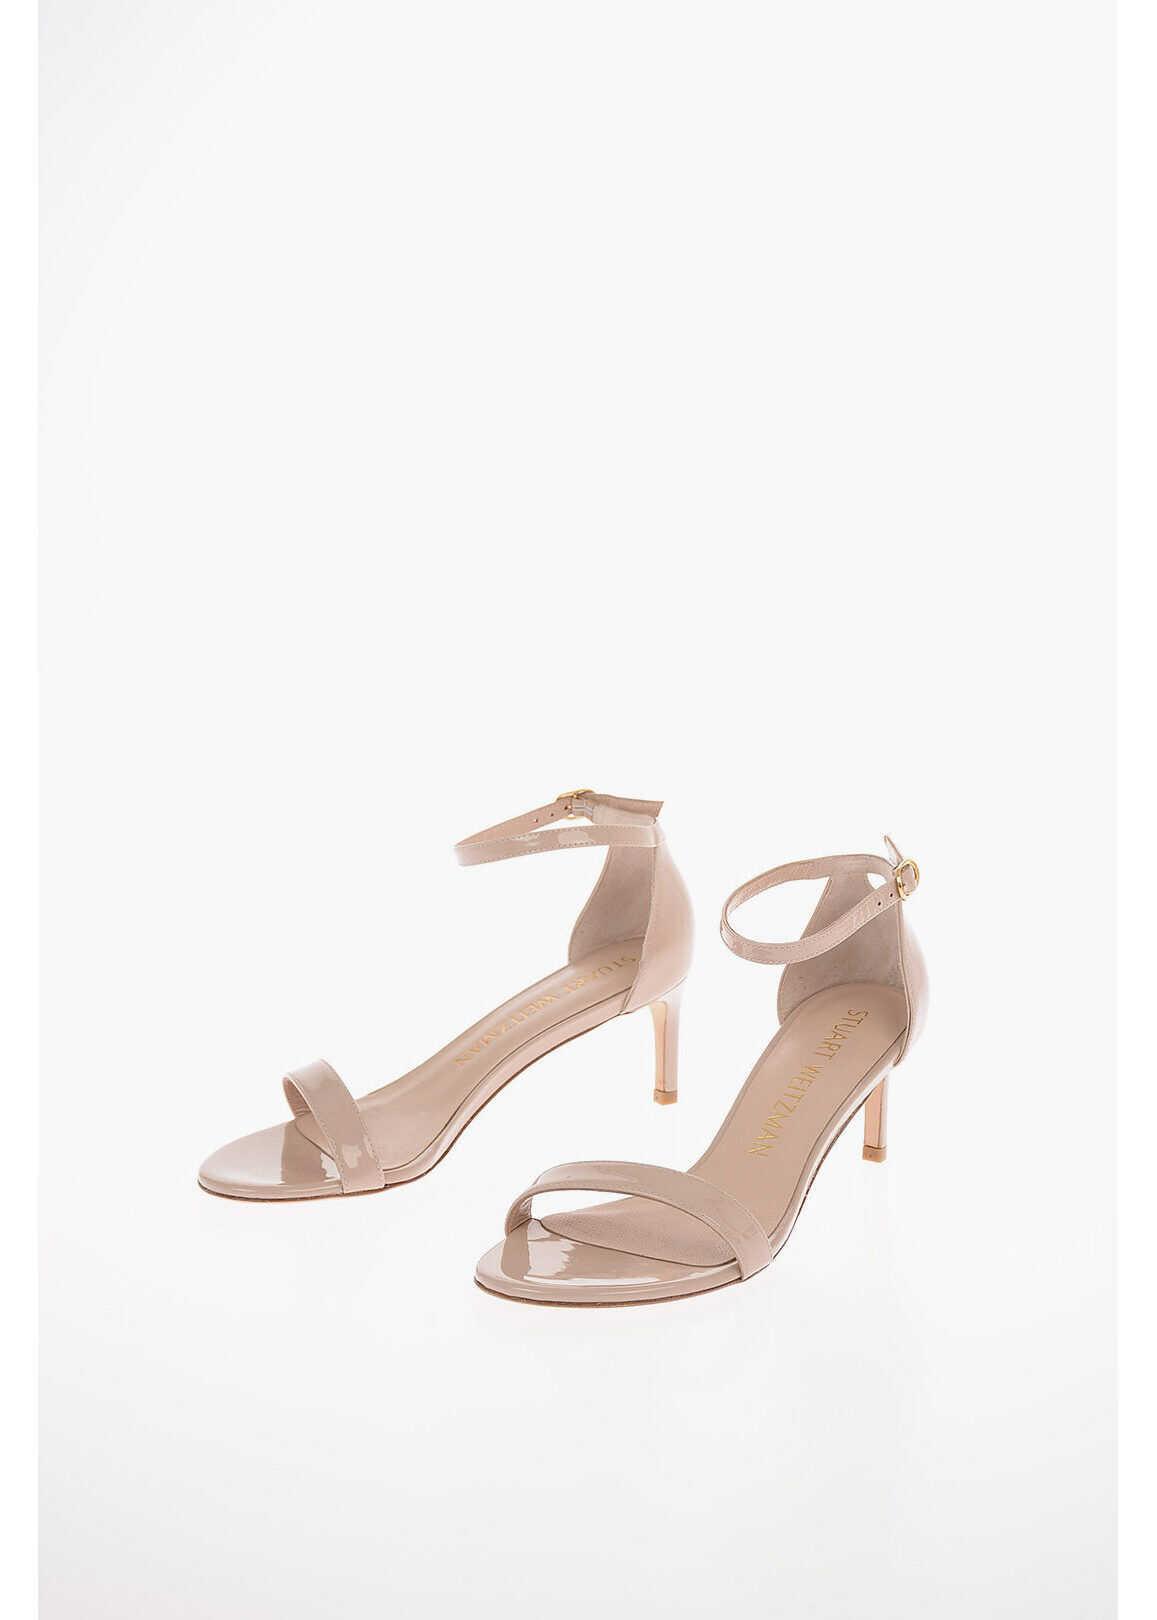 Stuart Weitzman Patent Leather NUNAKEDSTRIGHT 60 Sandals 6 cm PINK imagine b-mall.ro